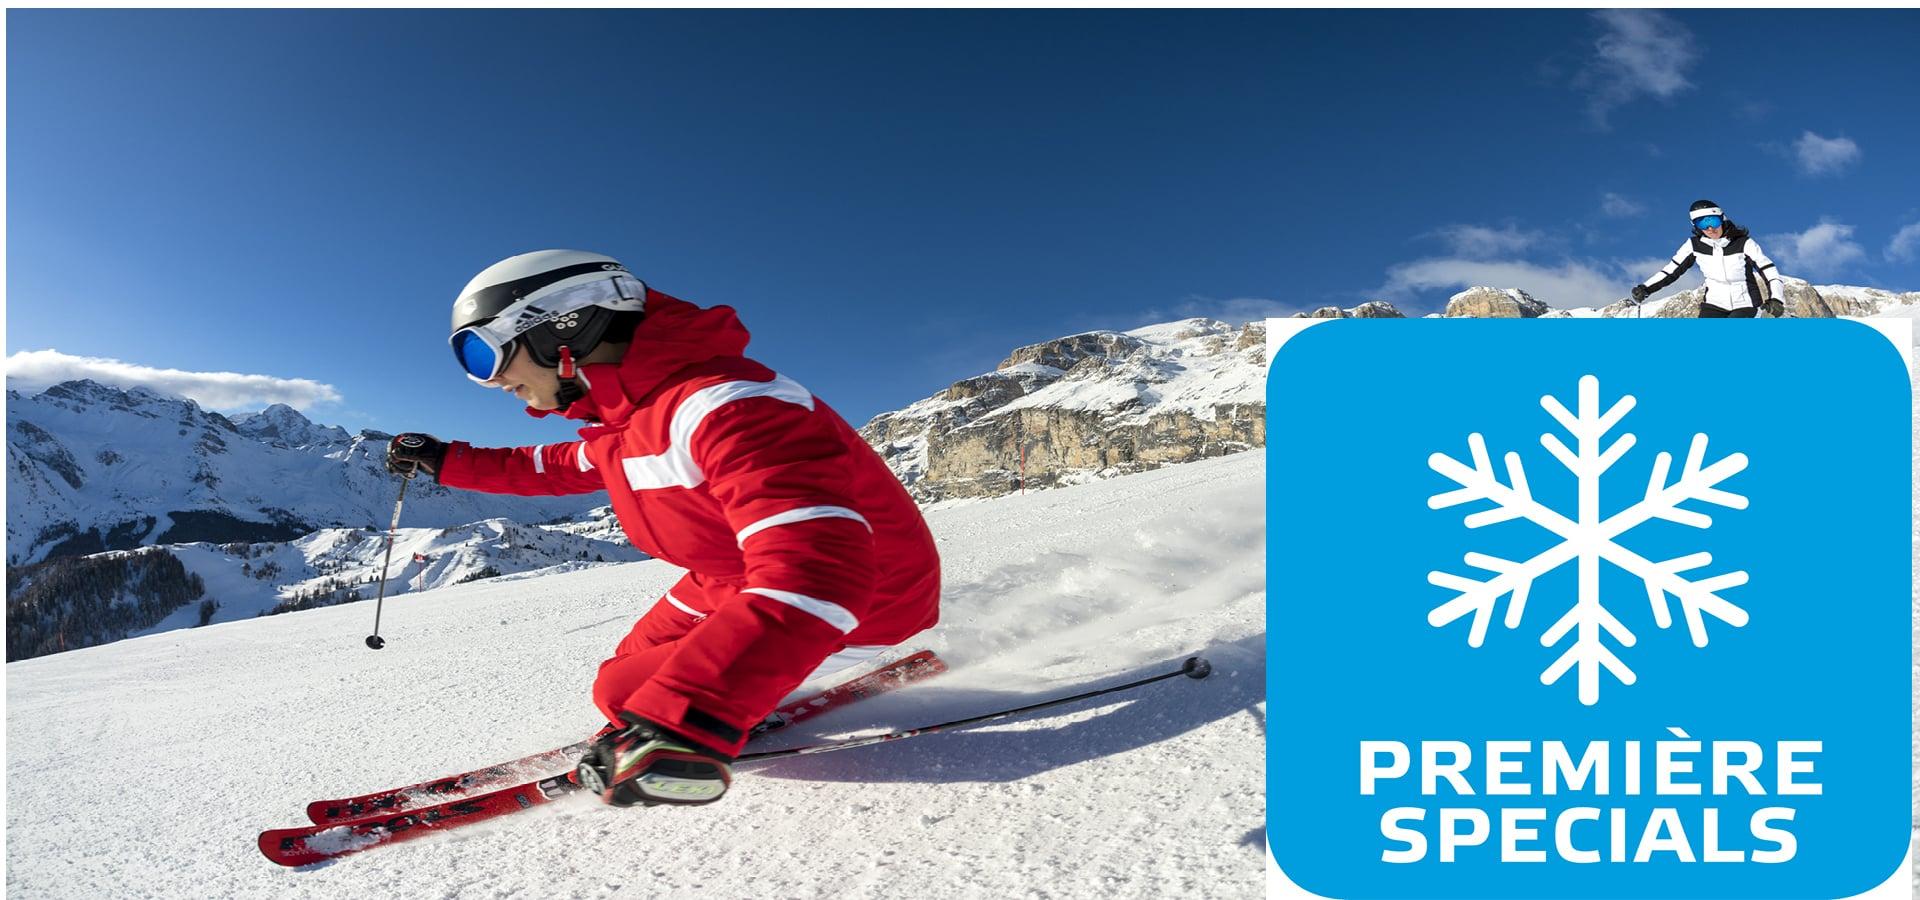 Dolomiti Super Première 2016